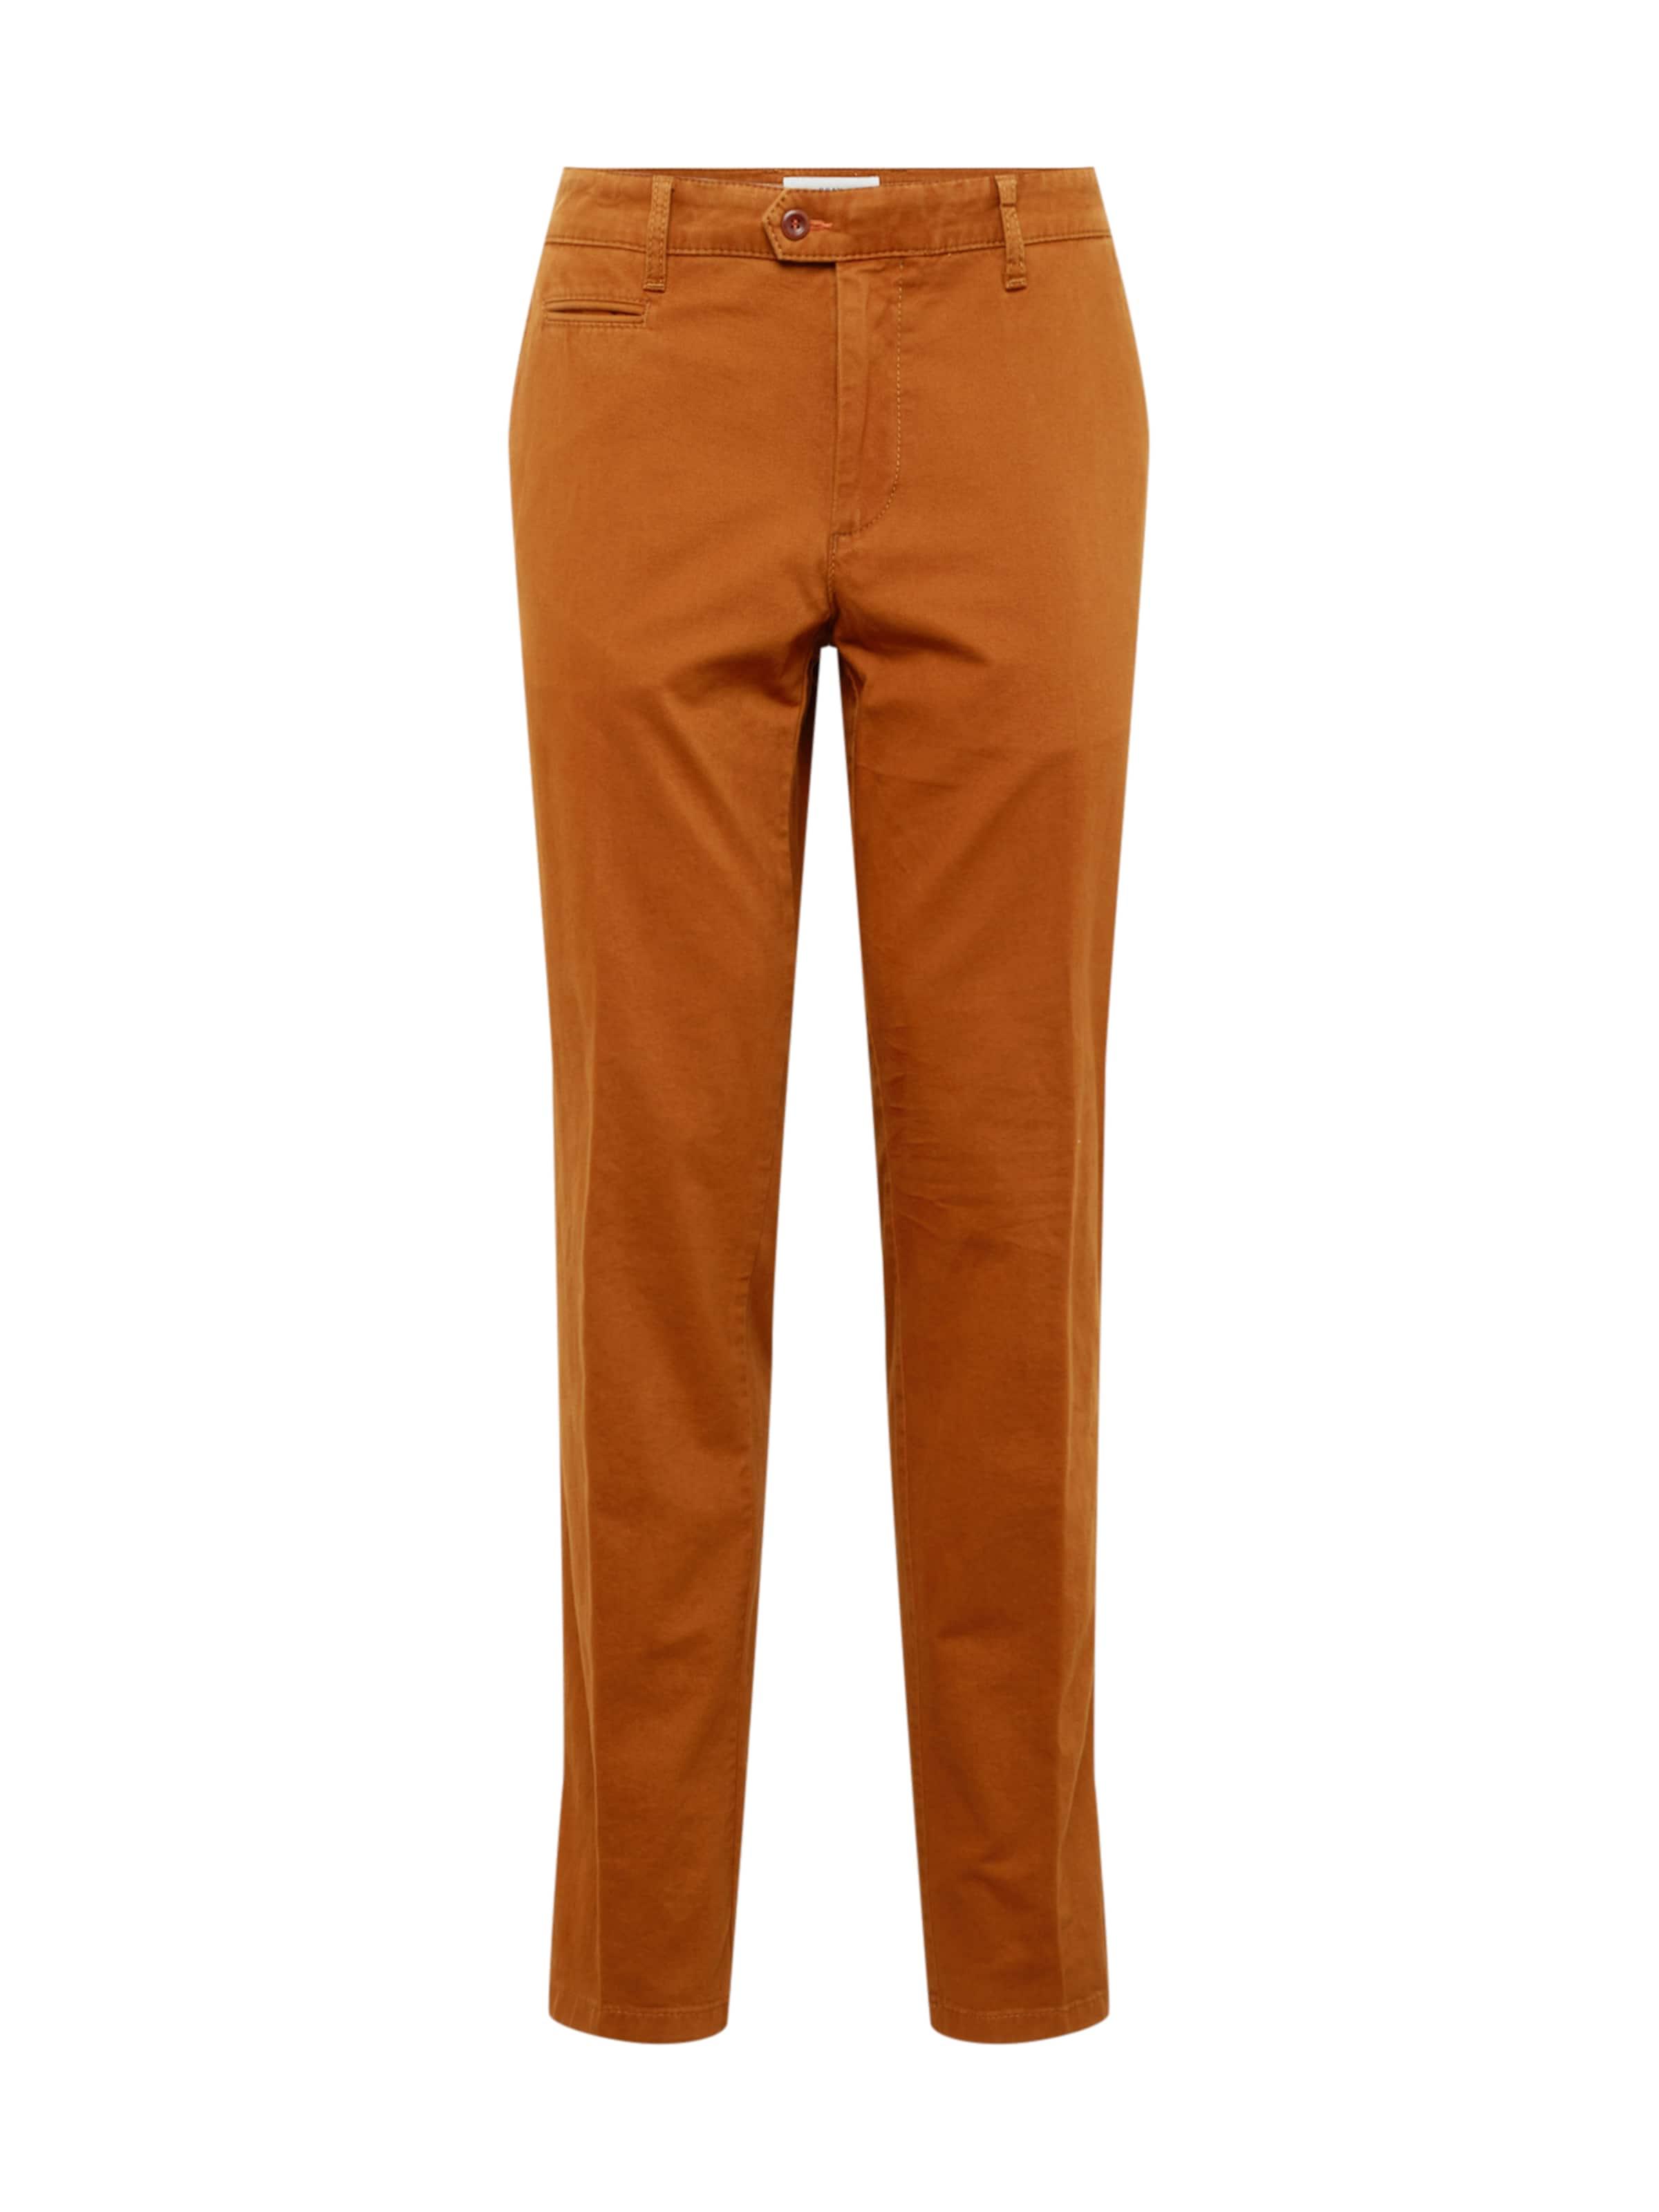 Pantalon En Curry Chino Brax 'everest' LSVpGqMzU